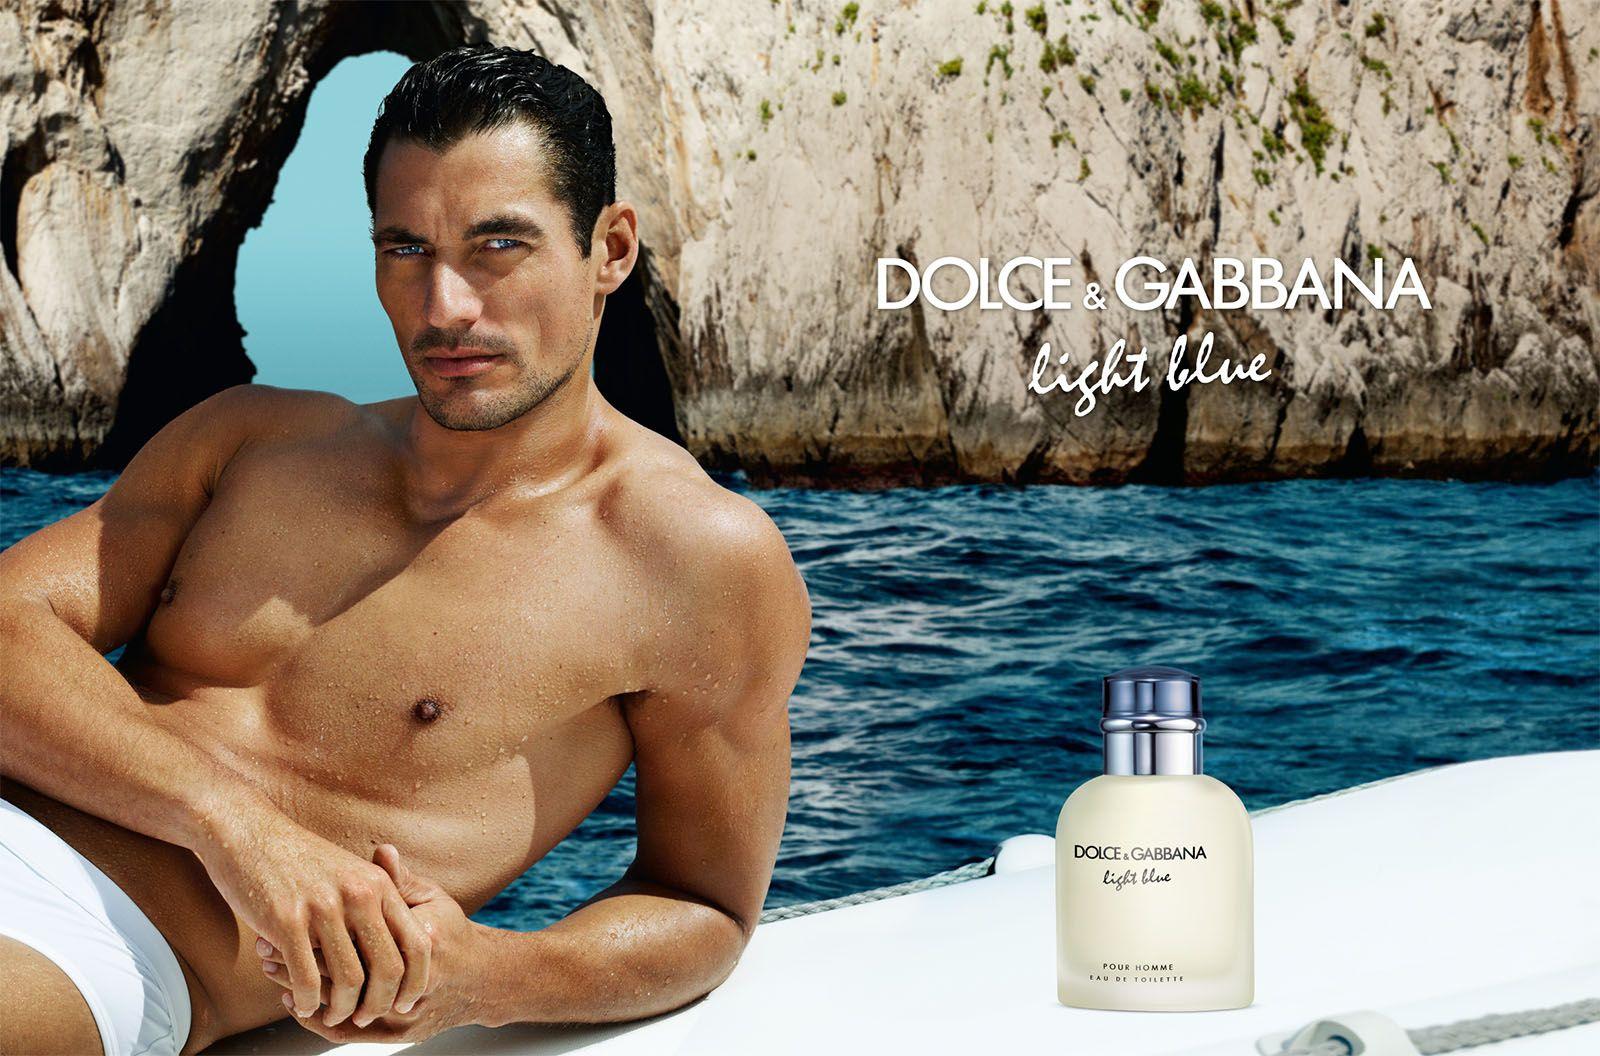 David Light Gandyperfume Dolce With Ad For Men Blue Campaign uTXOPZki